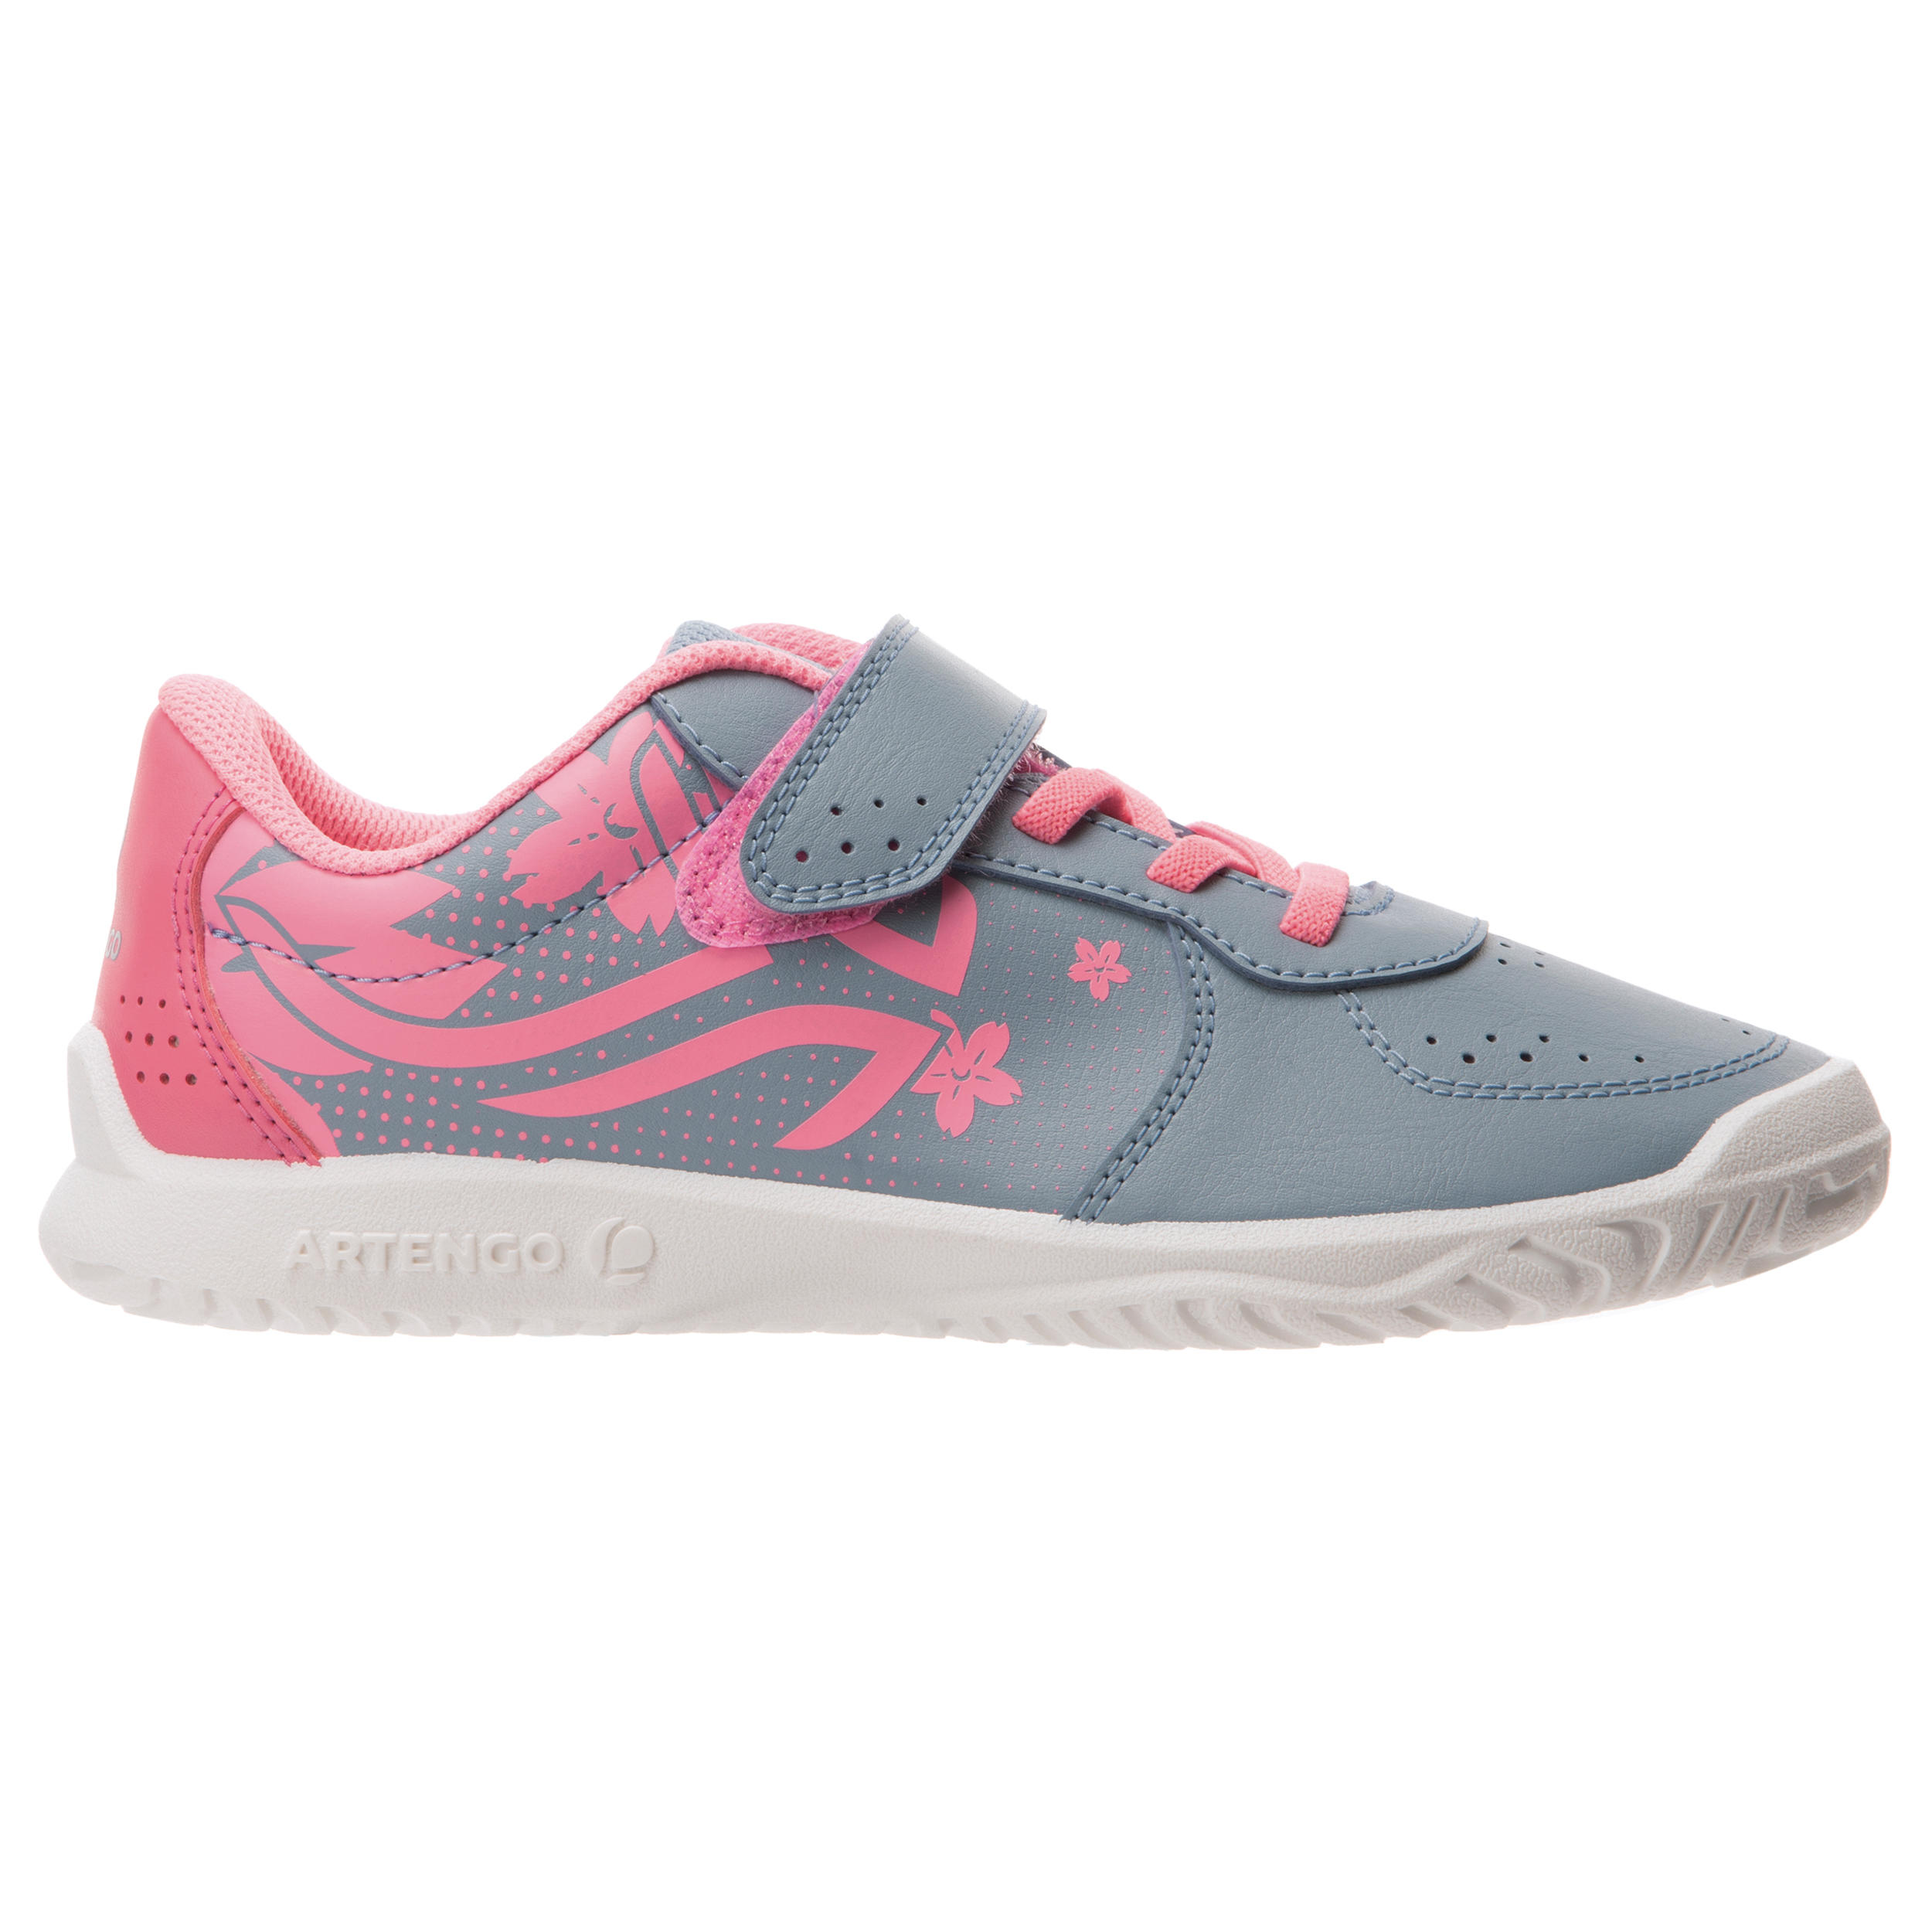 TS130 Kids Tennis Shoes - Grey/Pink